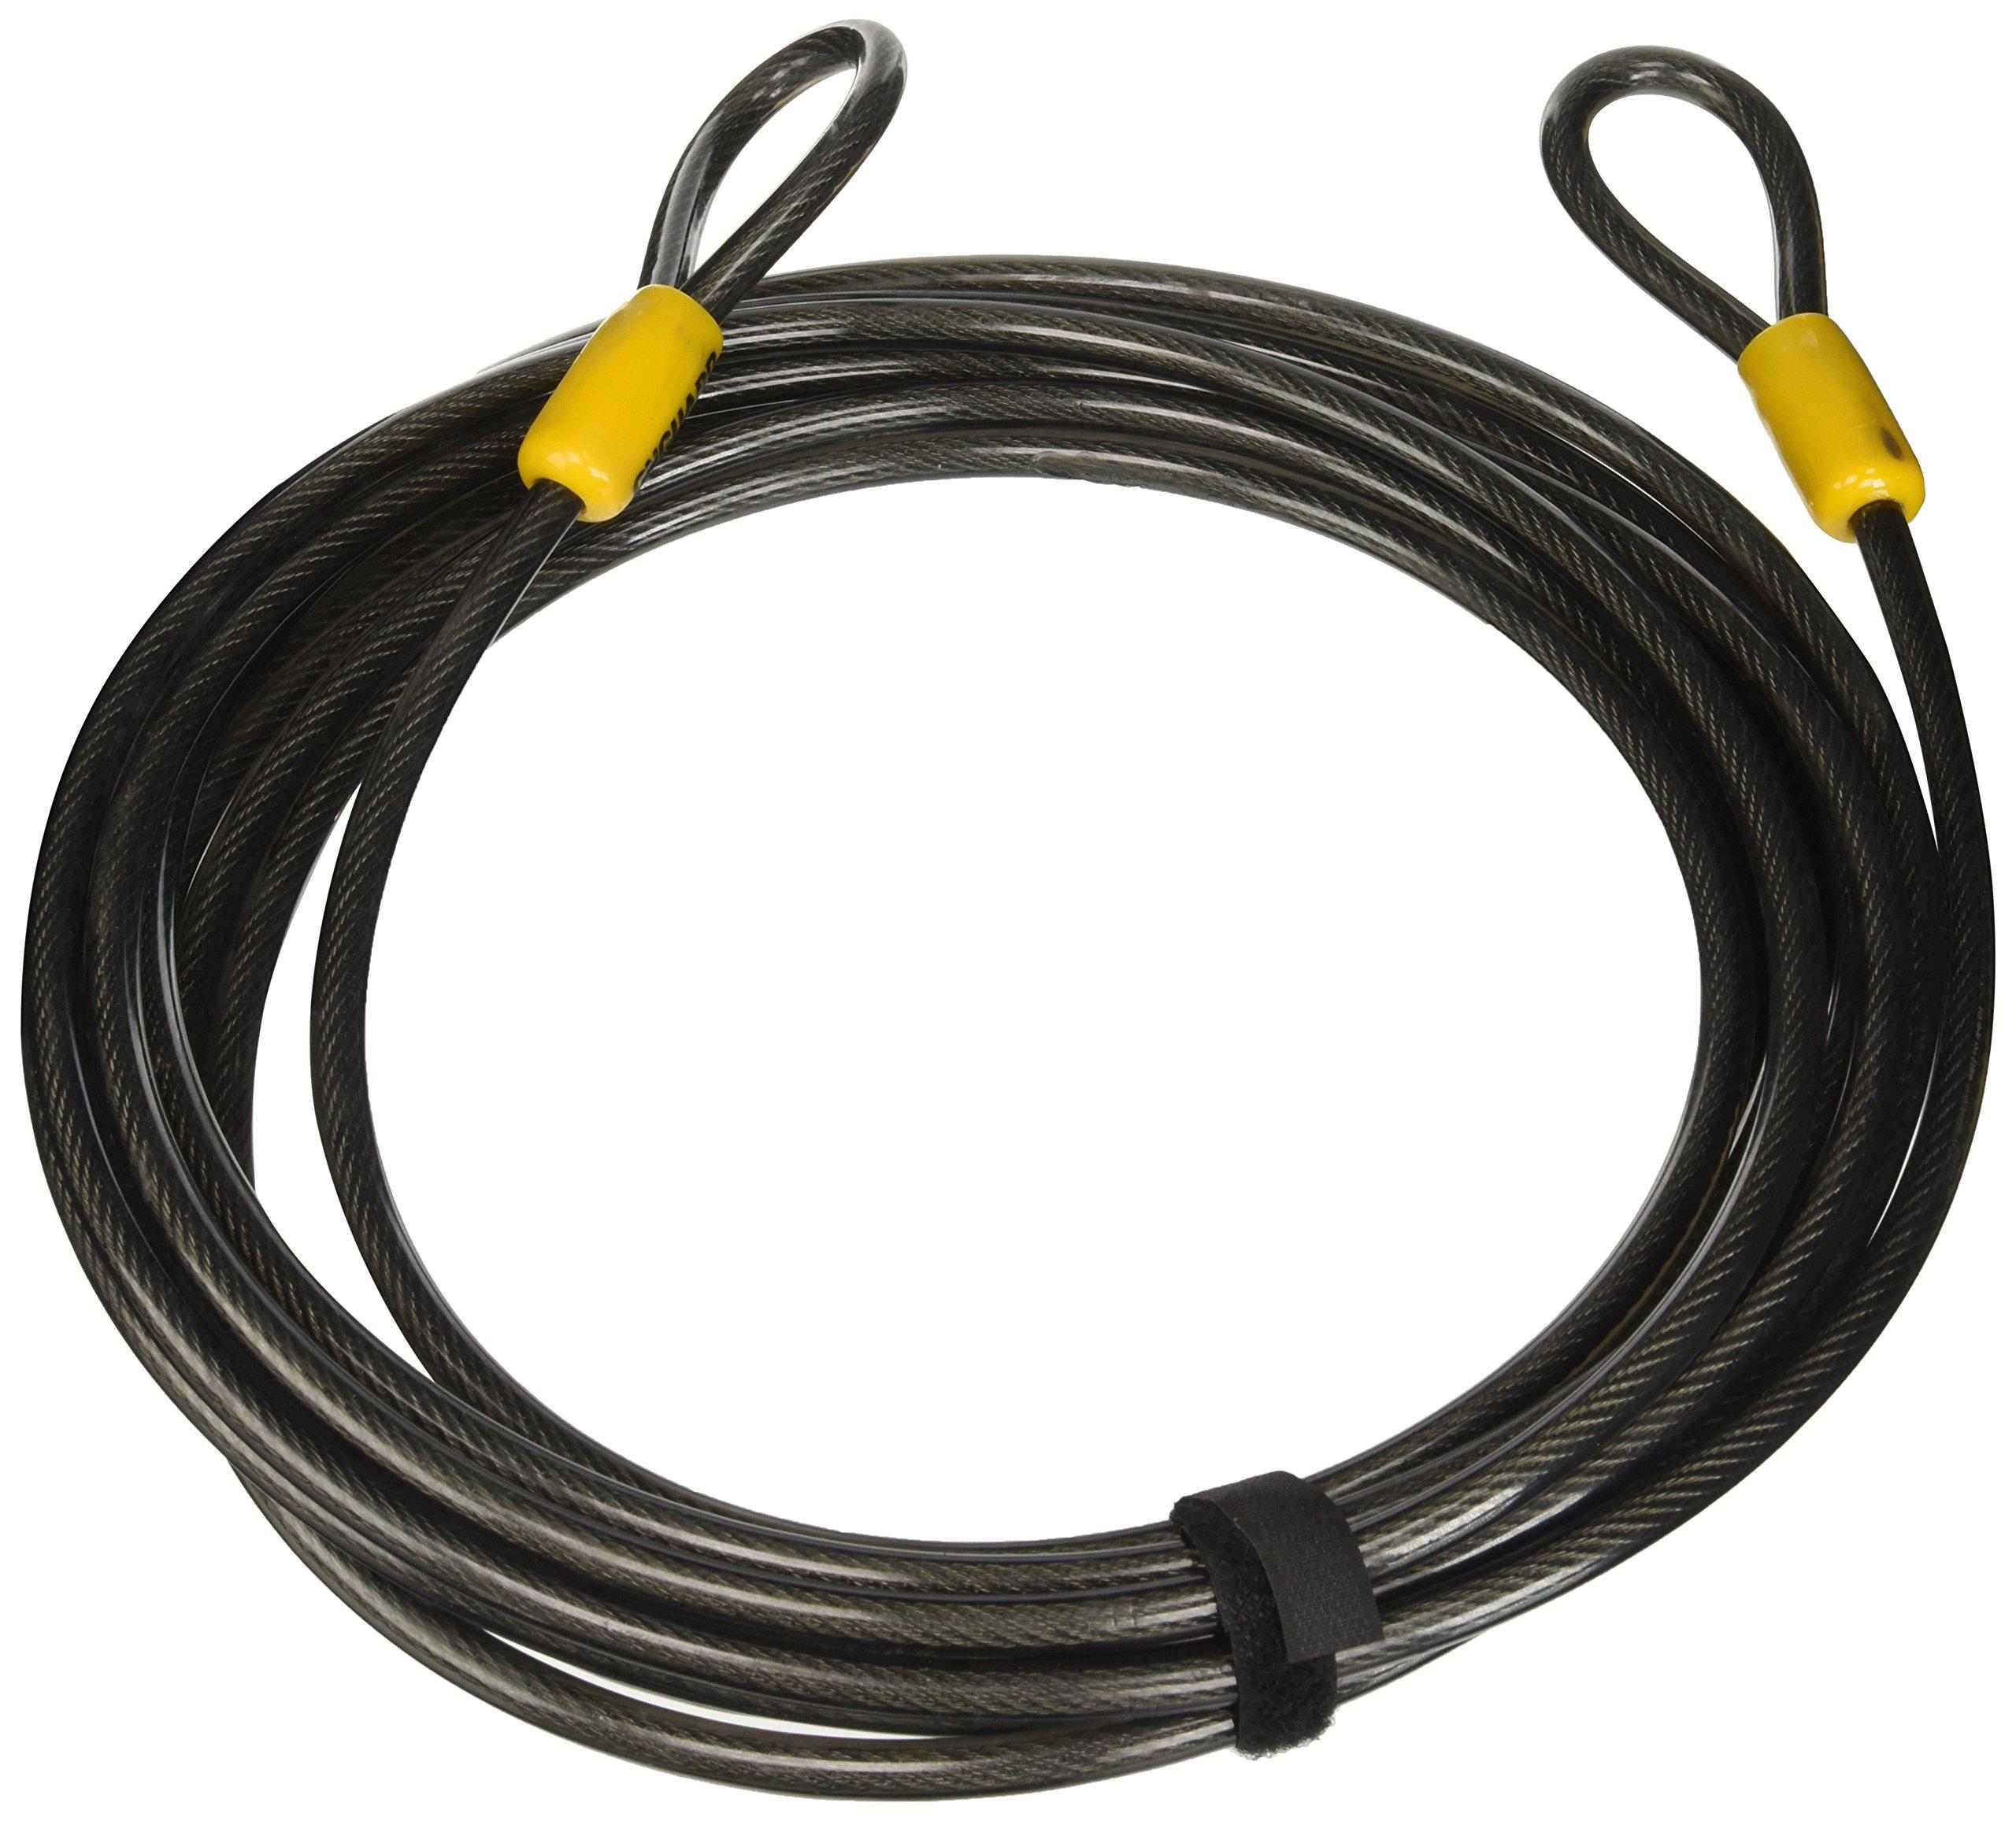 Black, 4.6m x 10 mm Onguard Akita Loop Cable Lock